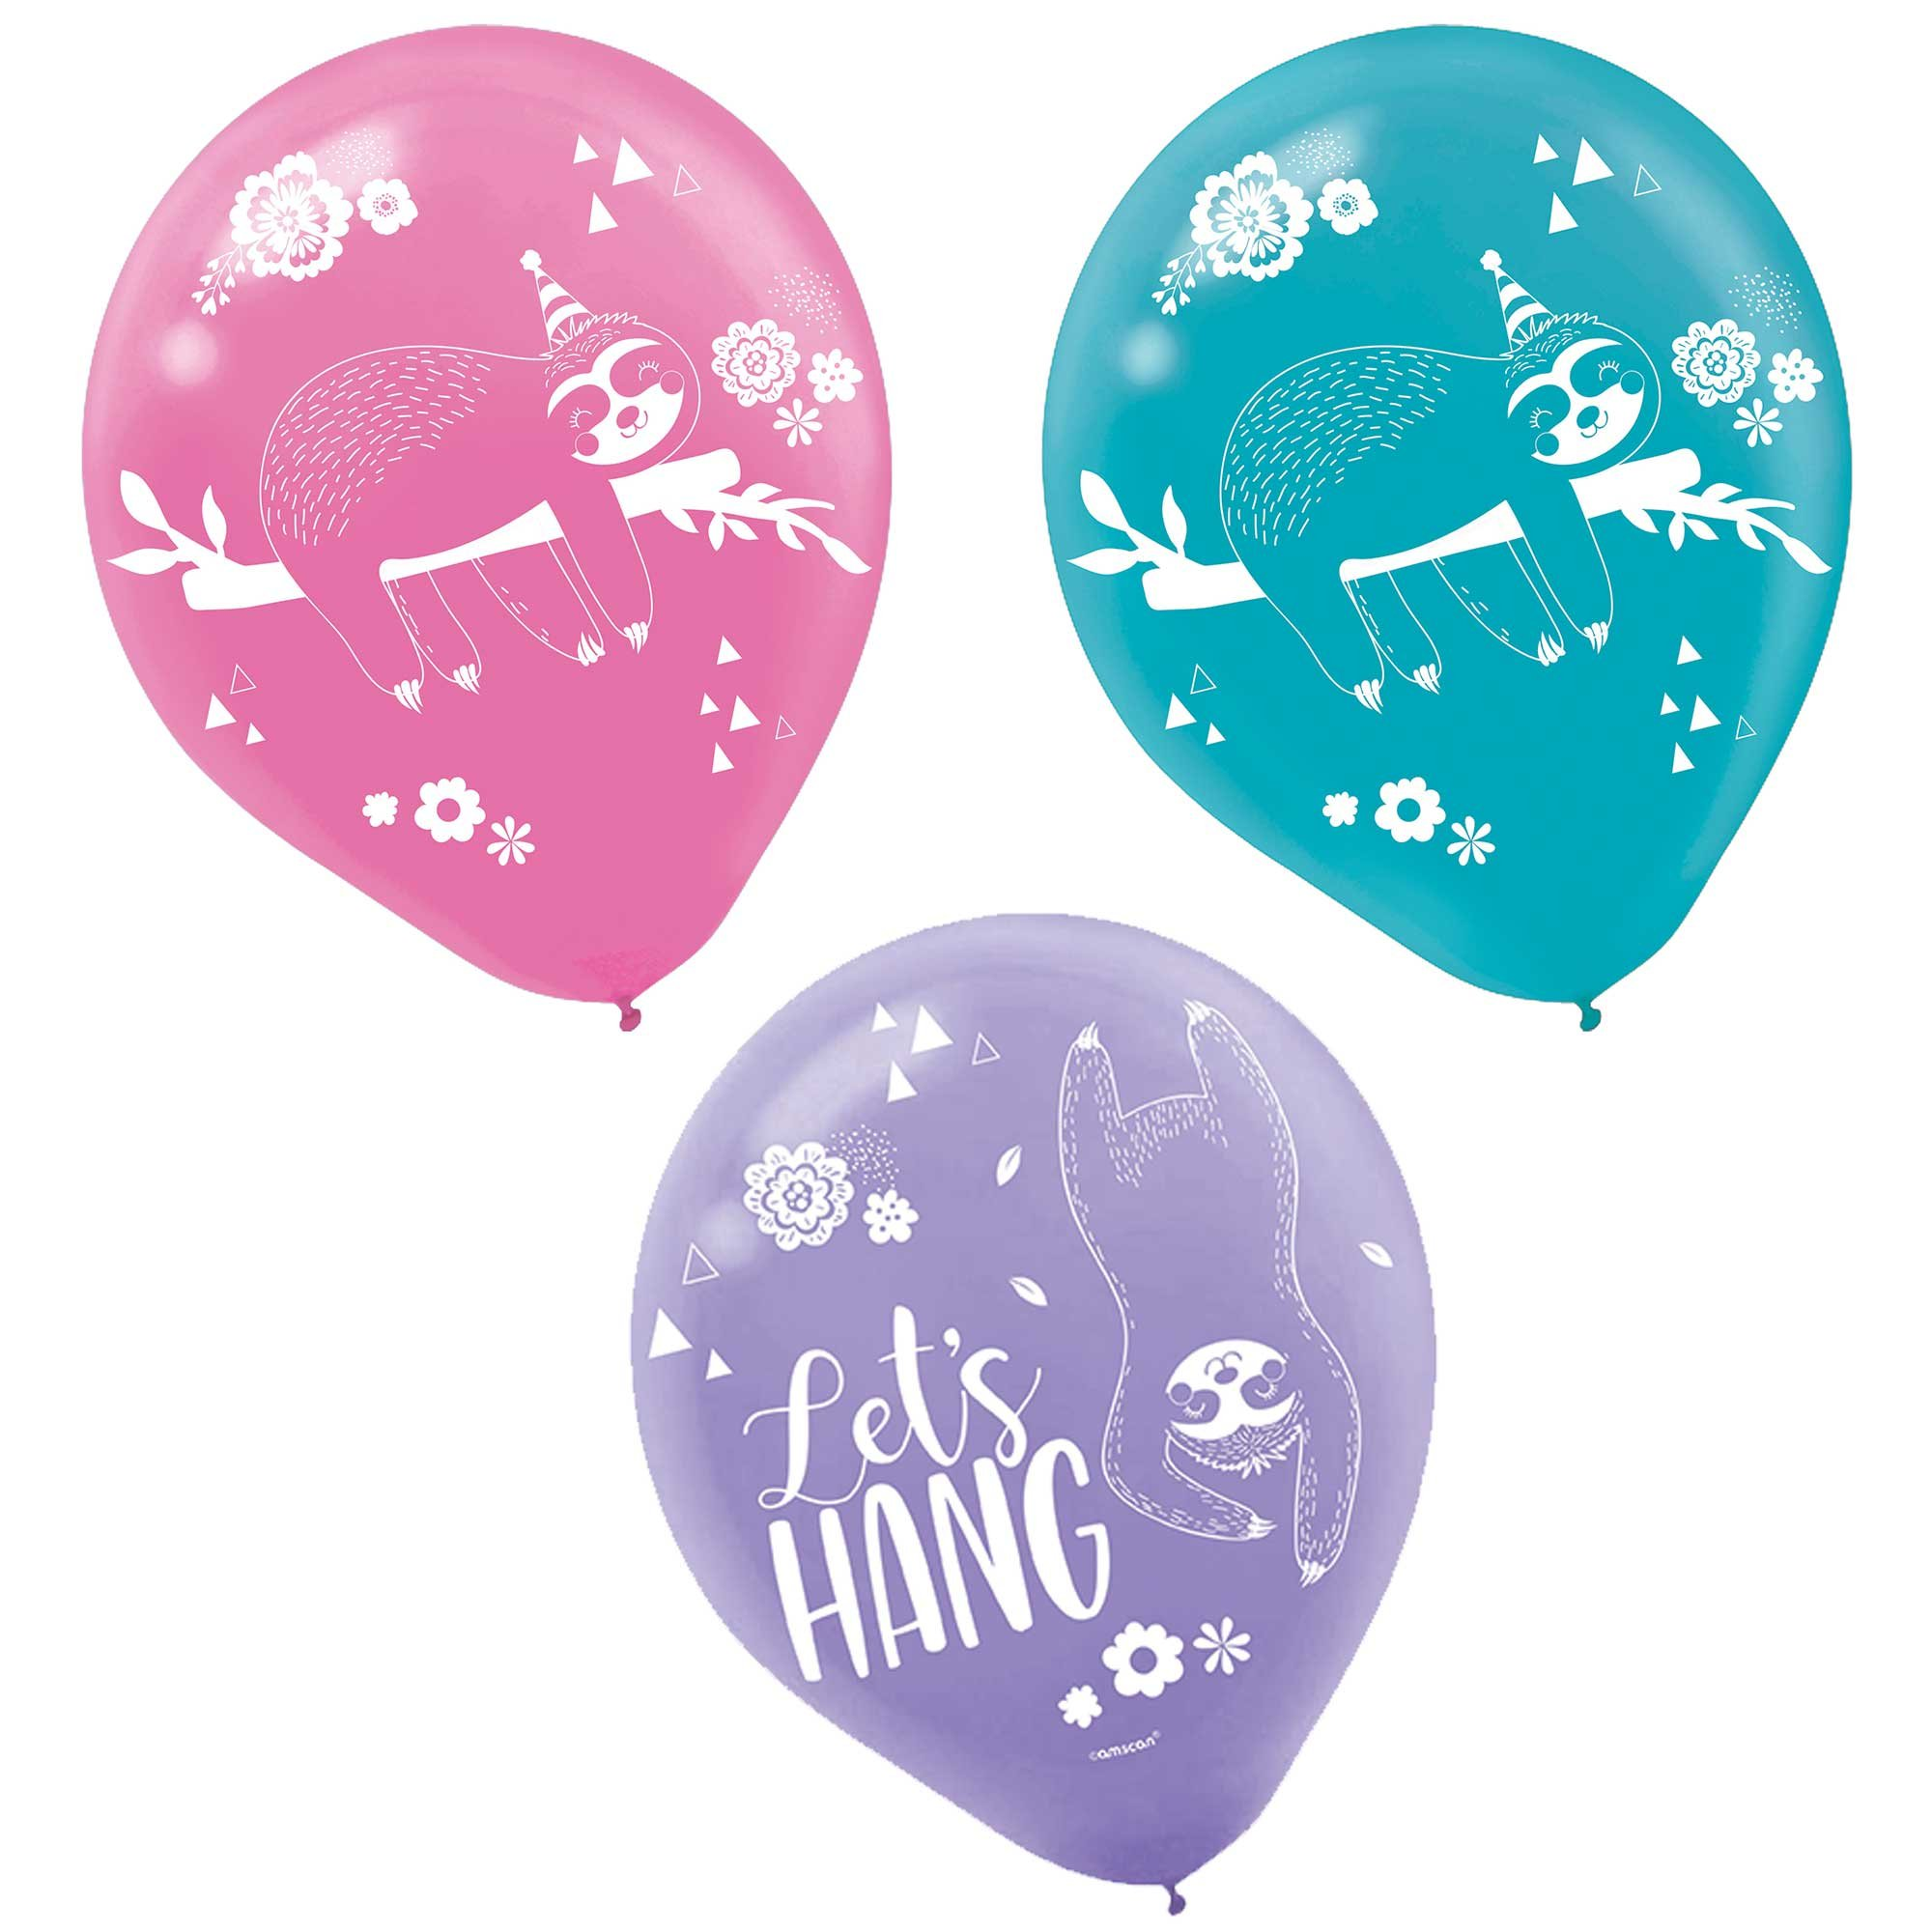 """Sloth 12""""/ 30cm Latex Balloons"